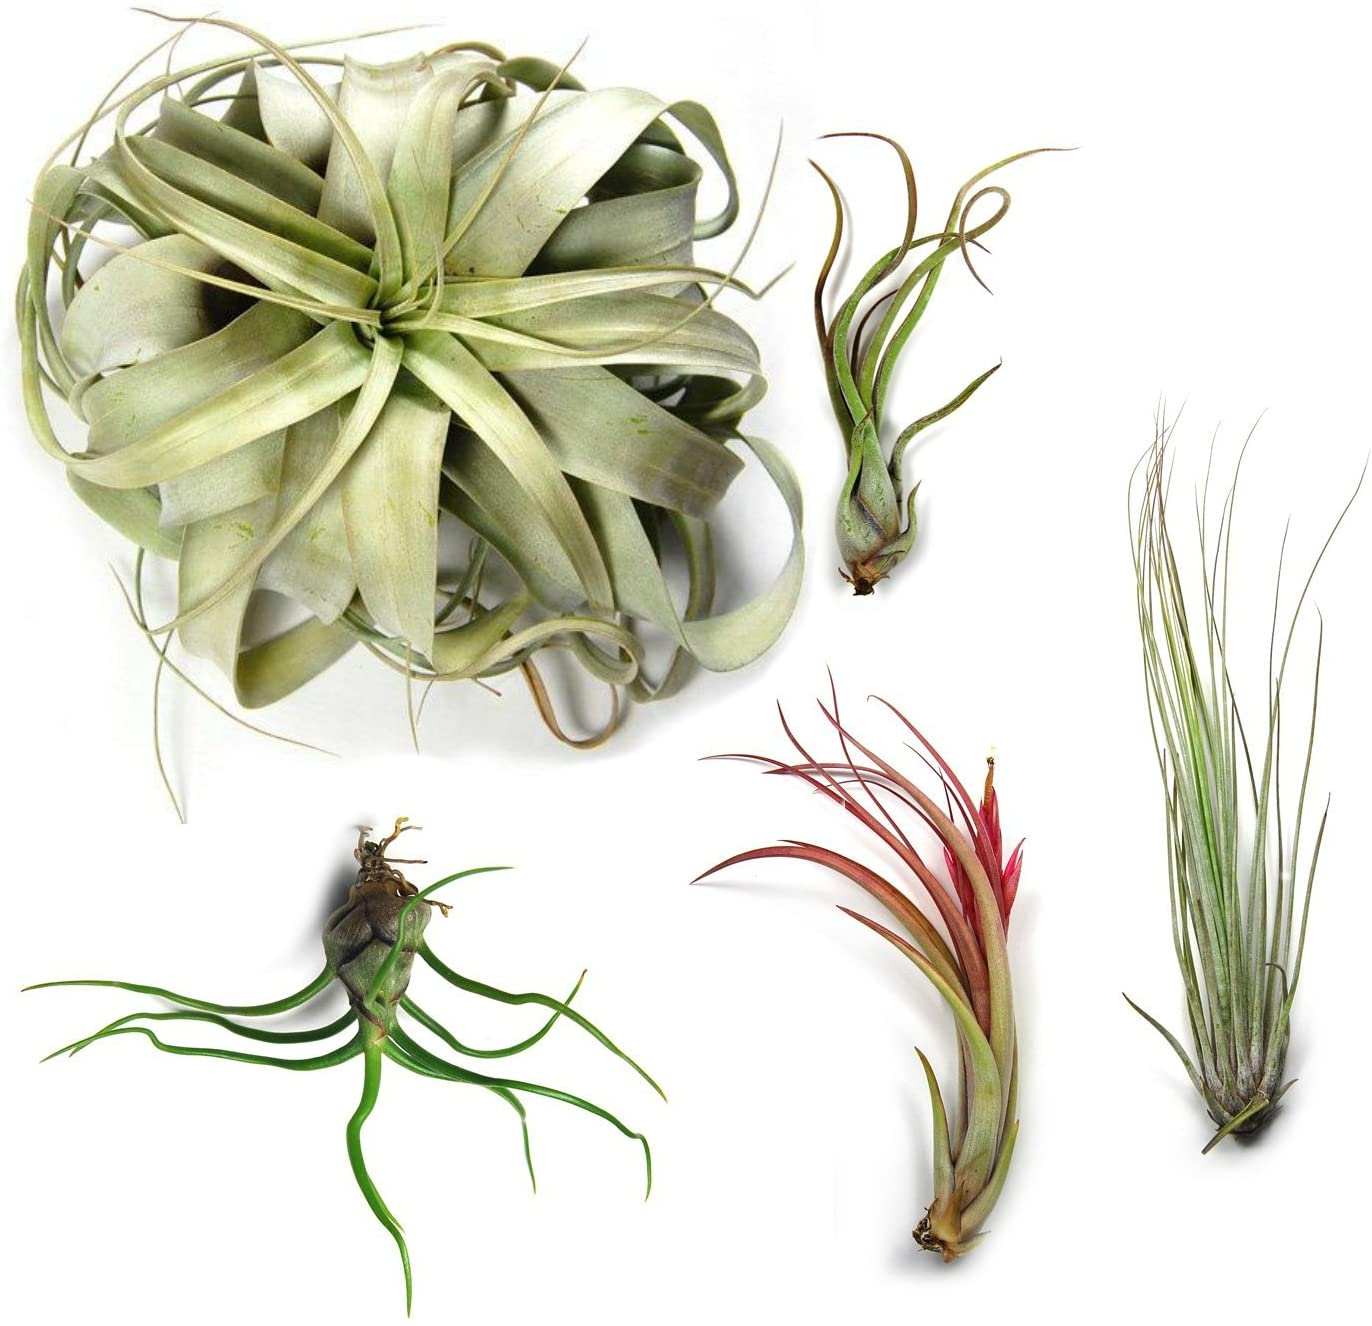 10 Pack Large Tillandsia Air Plants - 2 Xerographica, 2 Juncea, 2 Bulbosa, 2 Caput Medusae & 2 Circinata - 30 Day Guarantee - Succulents - House Plants - Free Air Plant Care eBook by Jody James